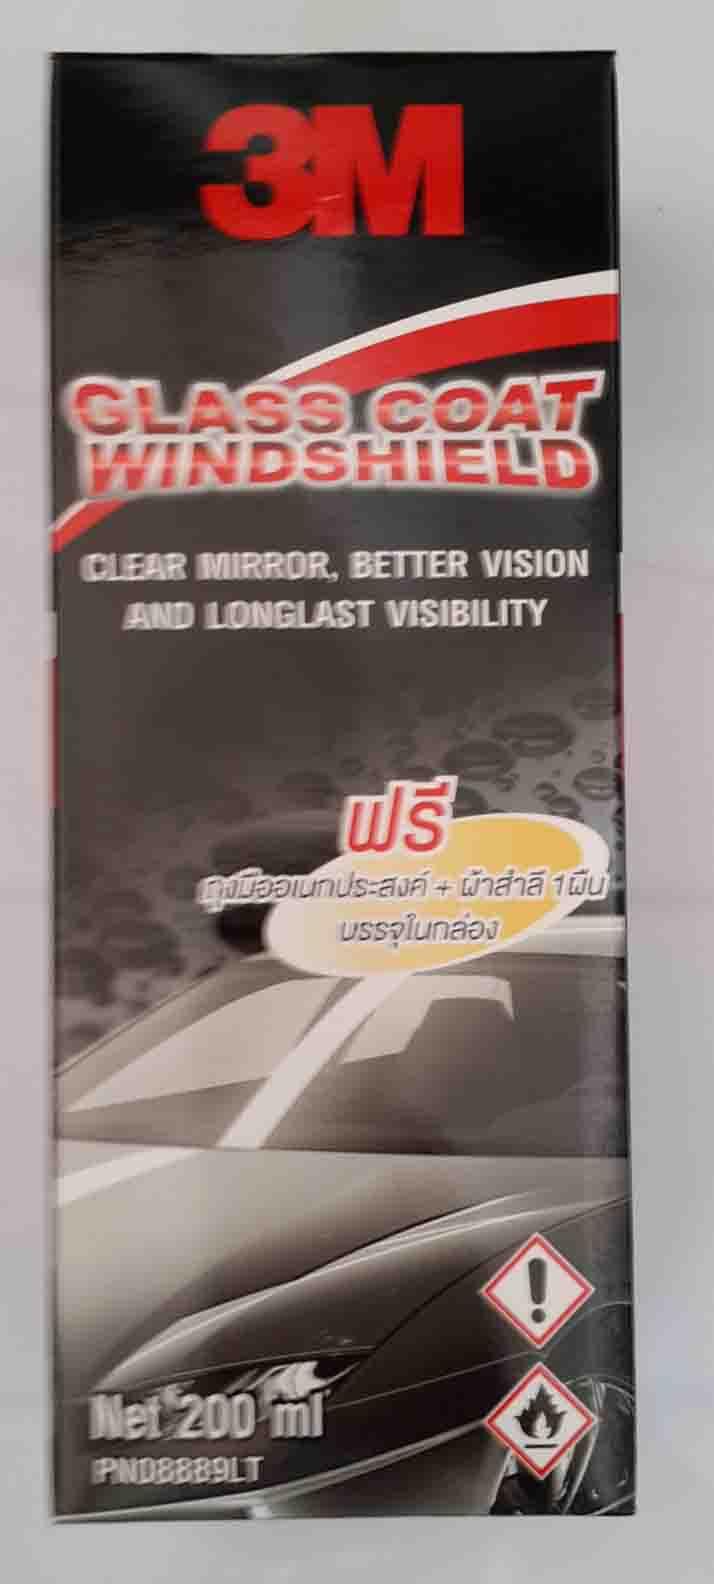 3M : น้ำยาเช็ดเคลือบกระจก Glass Coater Windshield